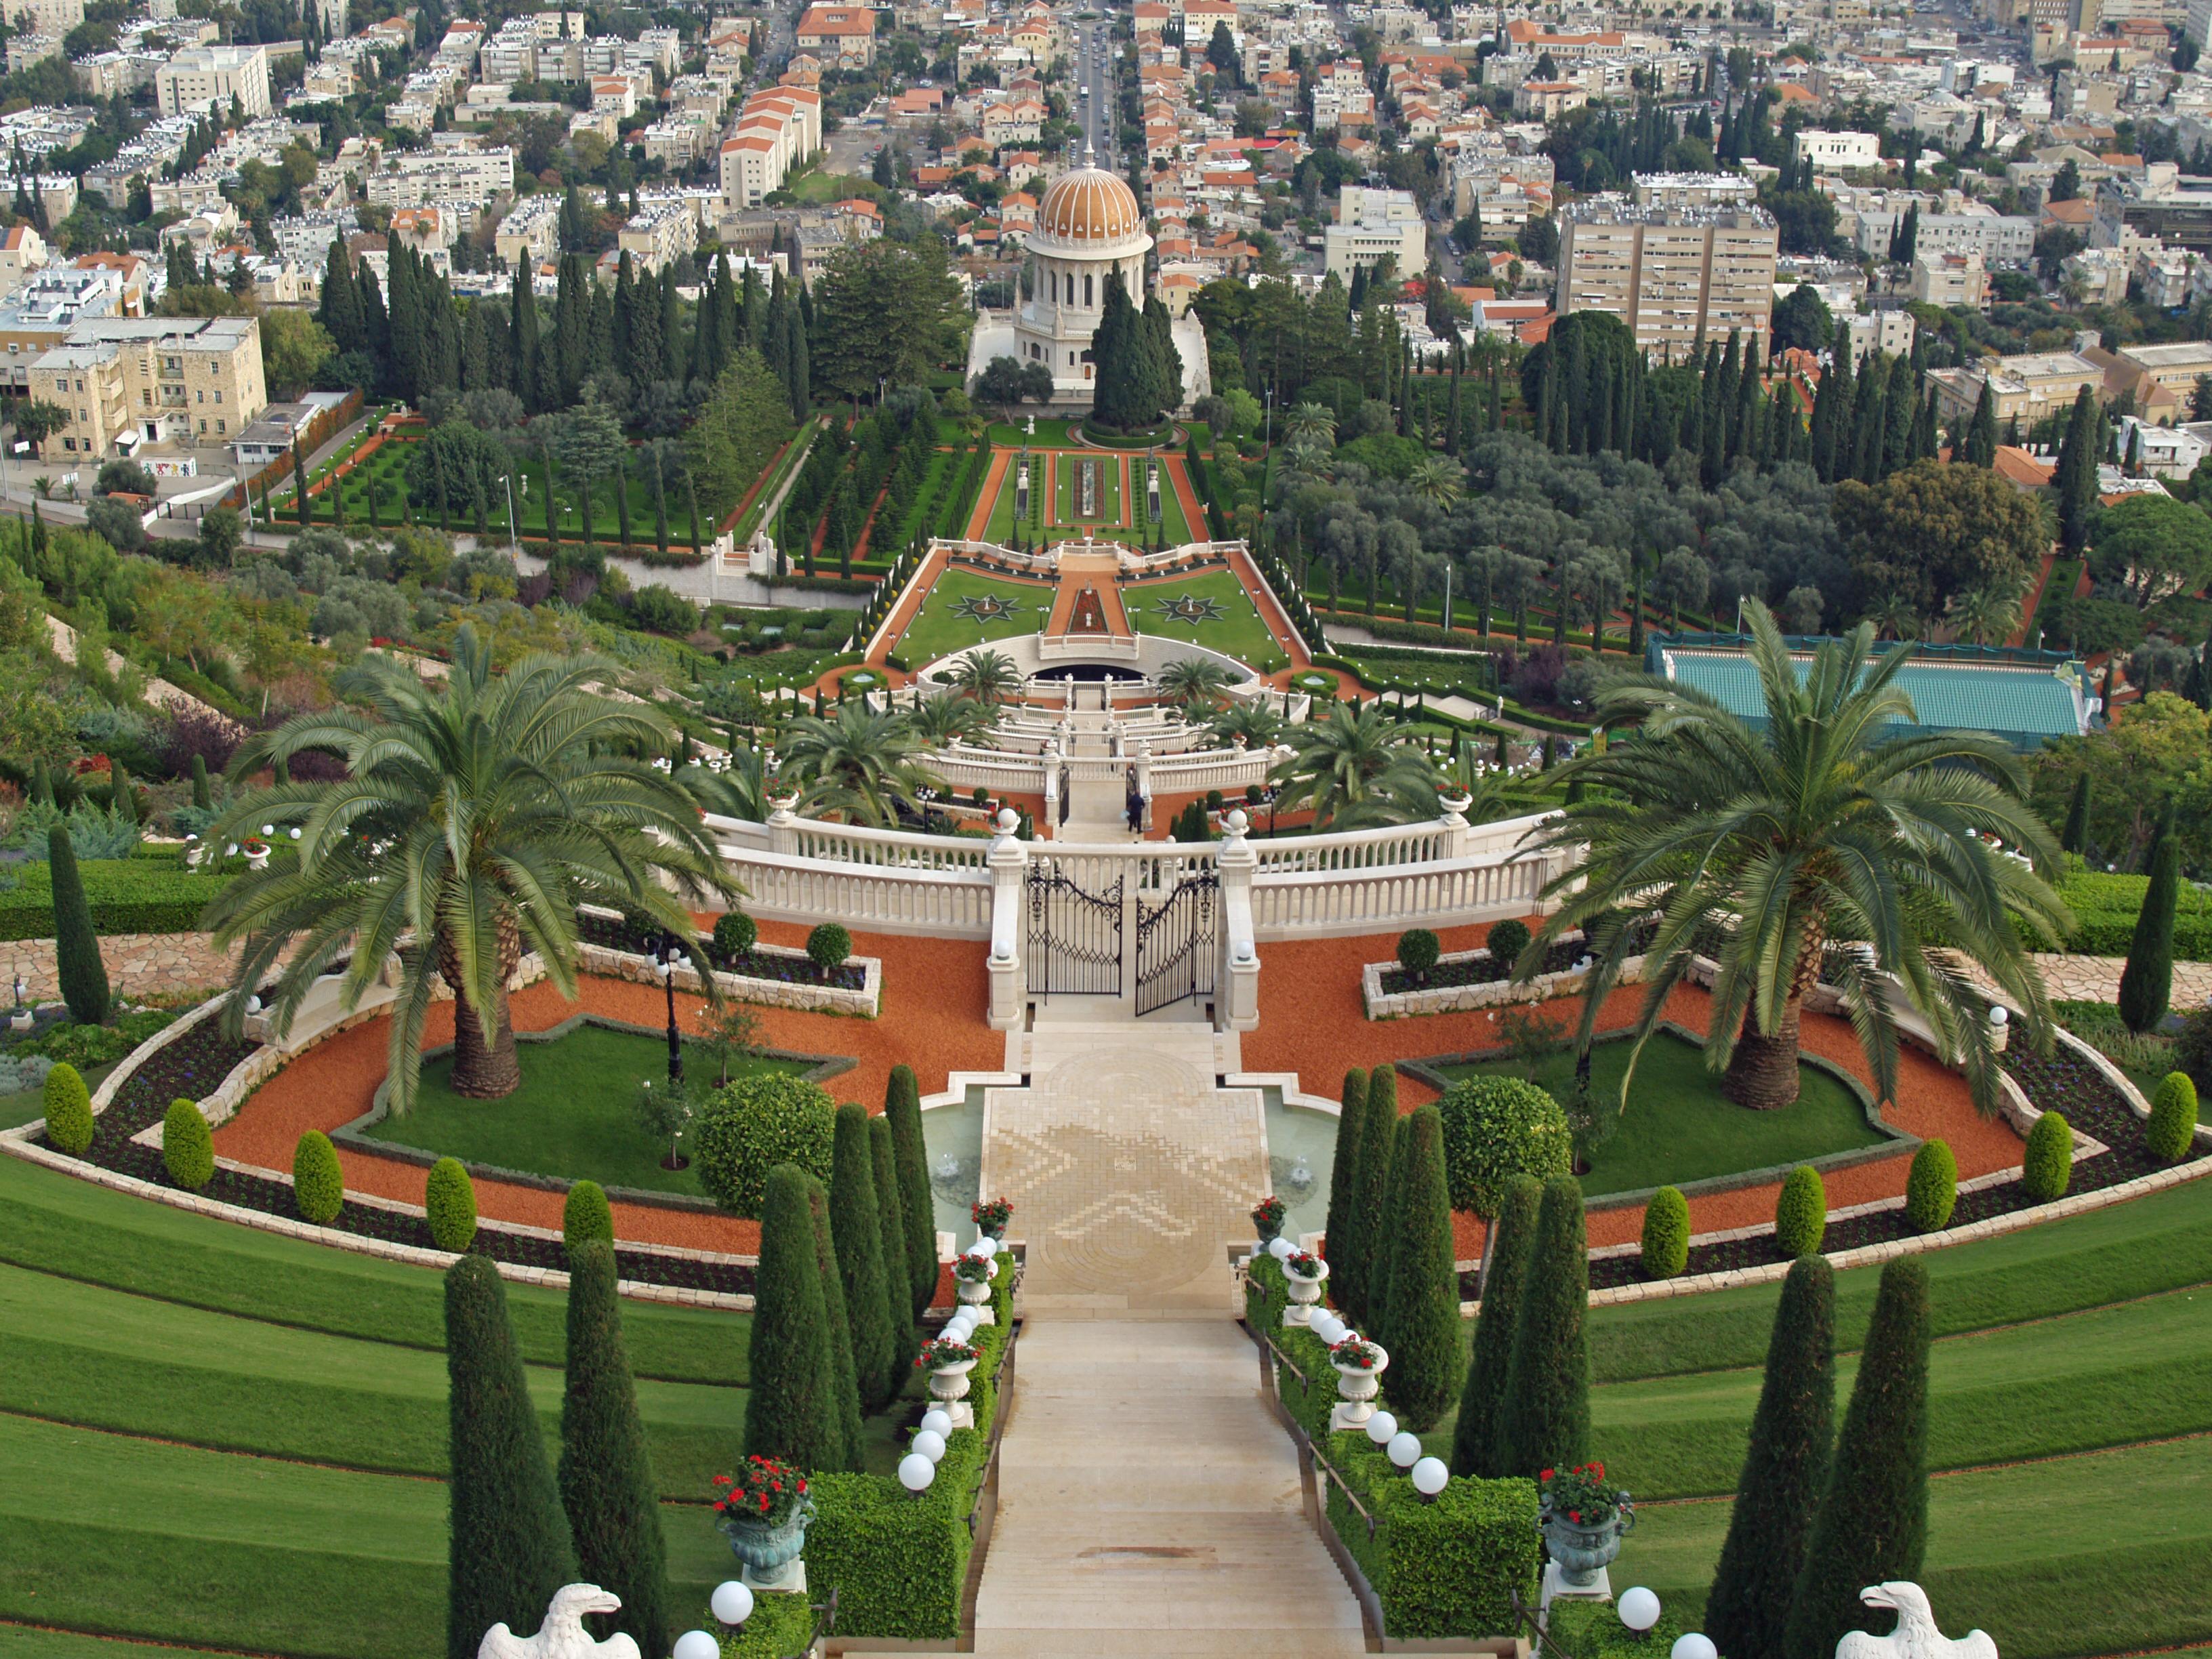 Izrael Bah%C3%A1%27%C3%AD_gardens_by_David_Shankbone